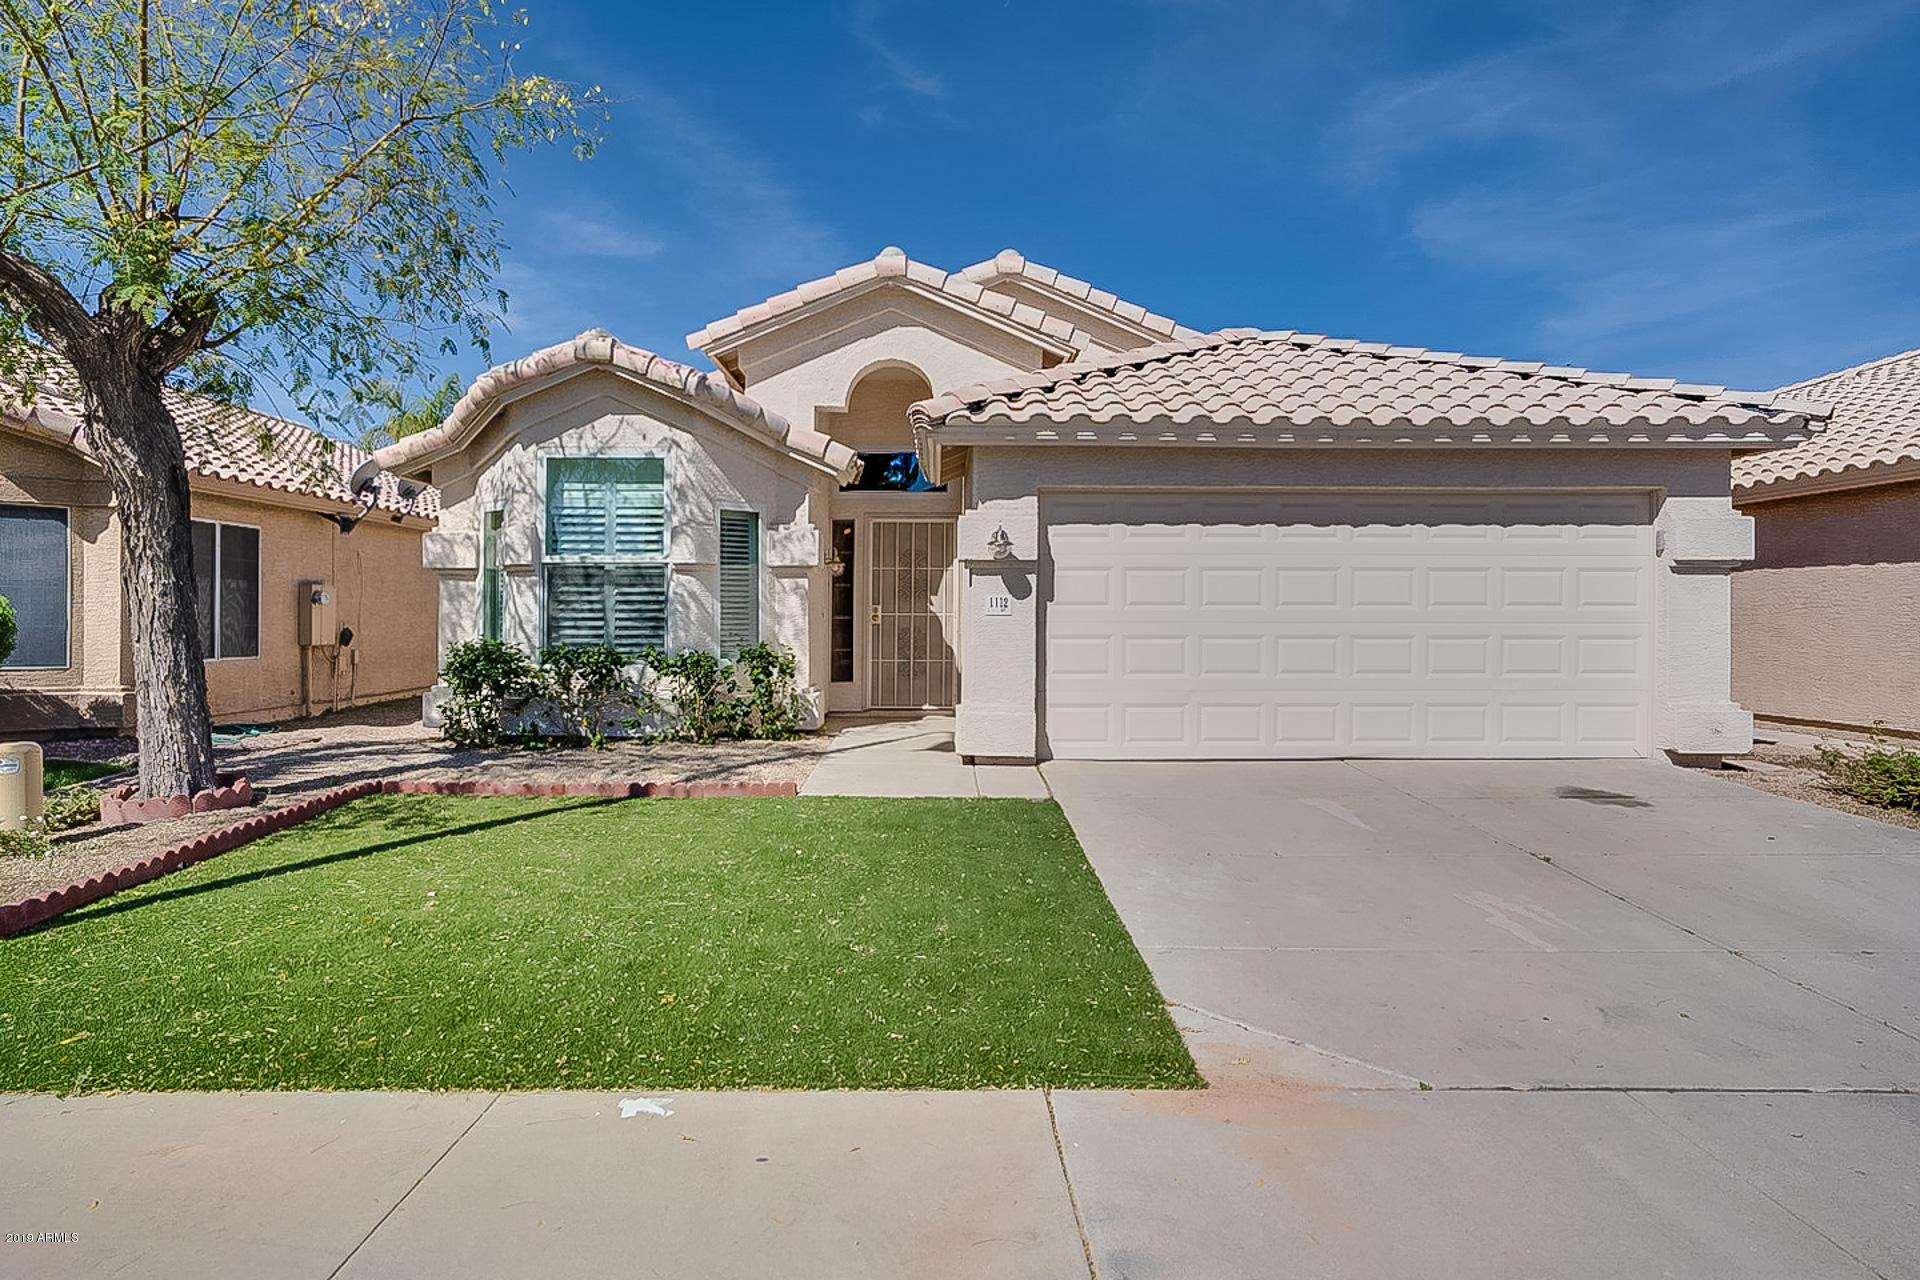 Photo of 1112 N BOGLE Avenue, Chandler, AZ 85225